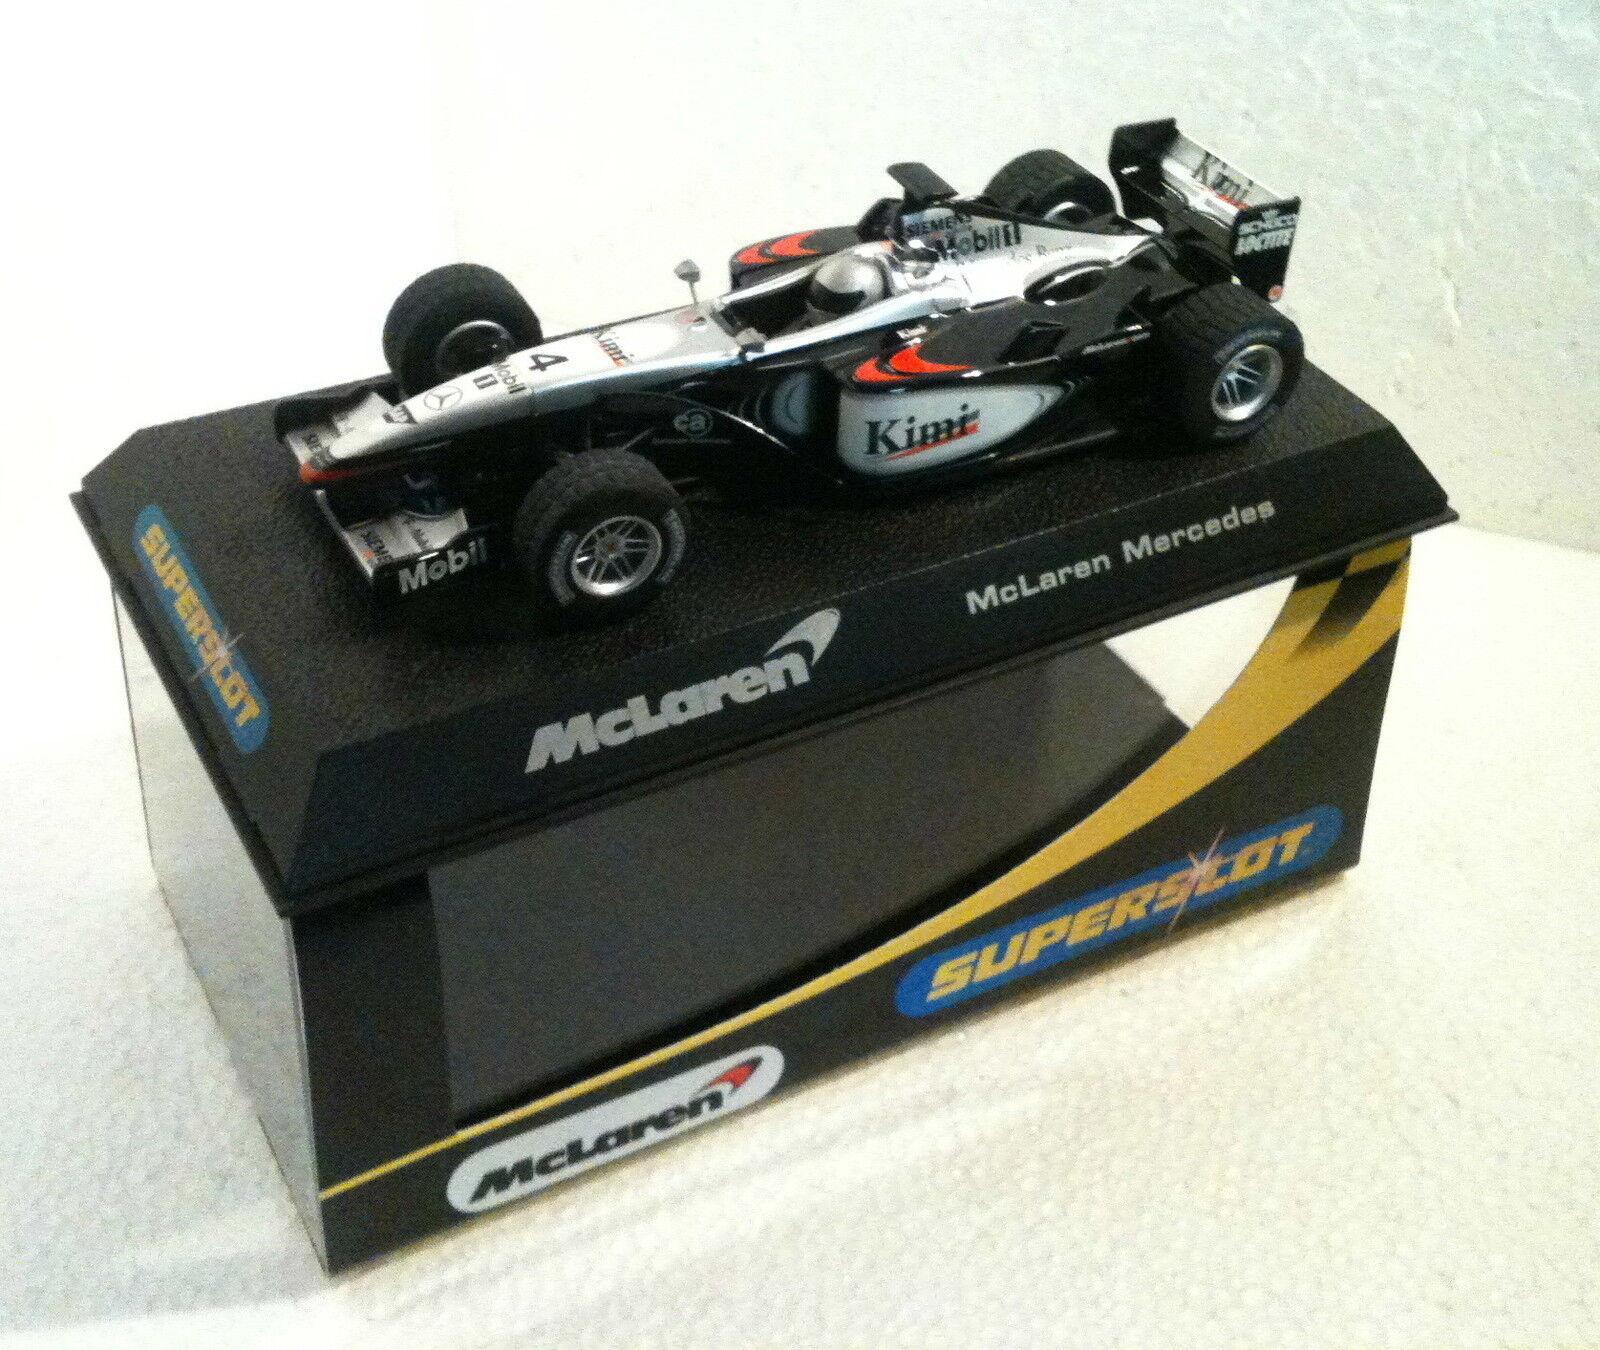 QQ H 2416 Superslot Mc Laren Mercedes F1 P4 -16 Kimi 2002 - Scalcextic Ru